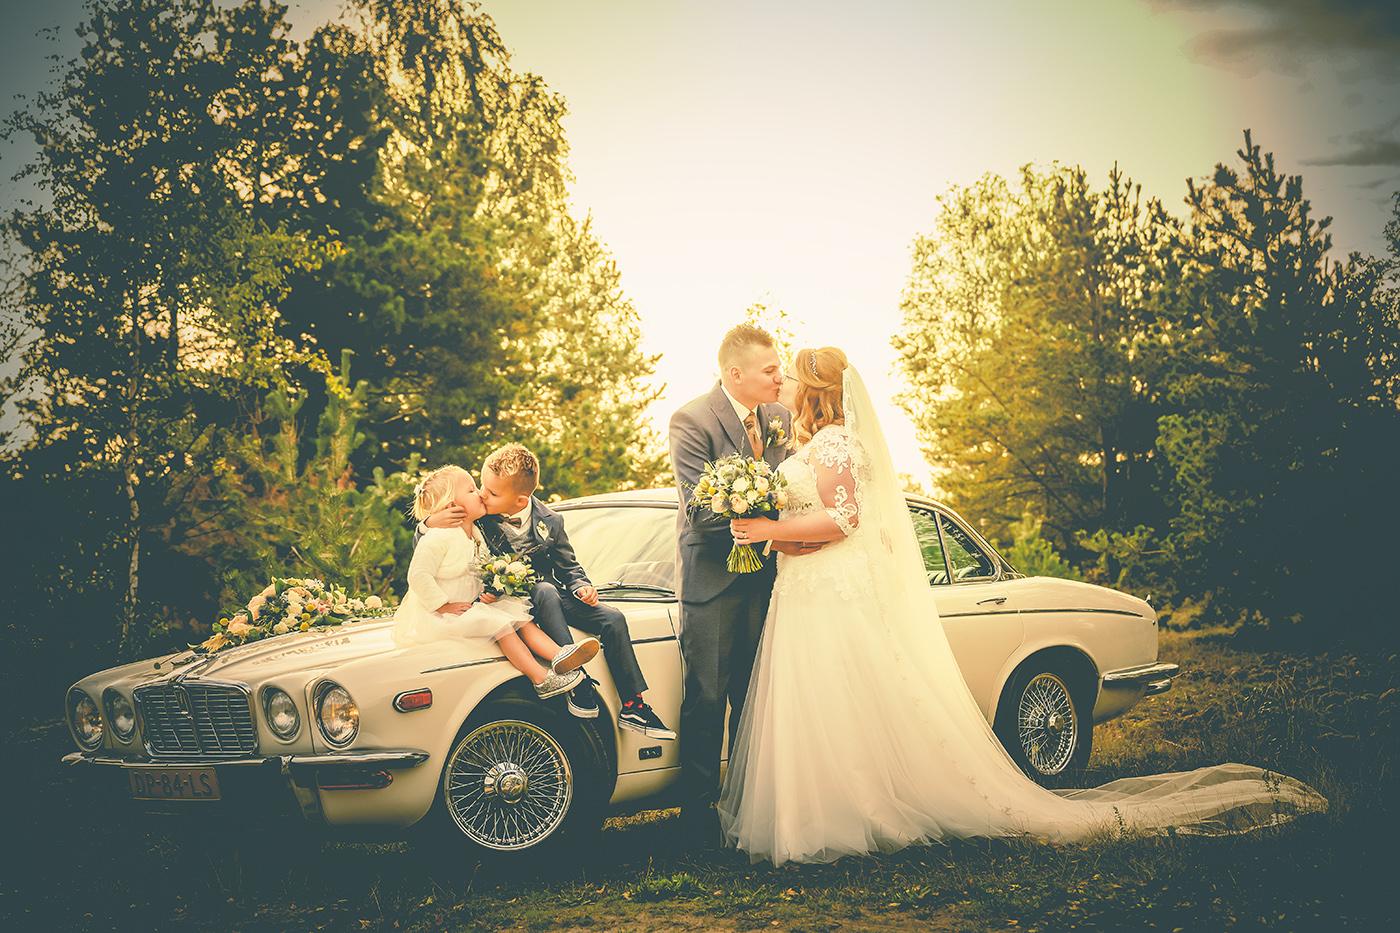 trouwfotograaf, Wouter van Middendorp, bruidsfotografie, Uddel, Elspeet Barneveld 00